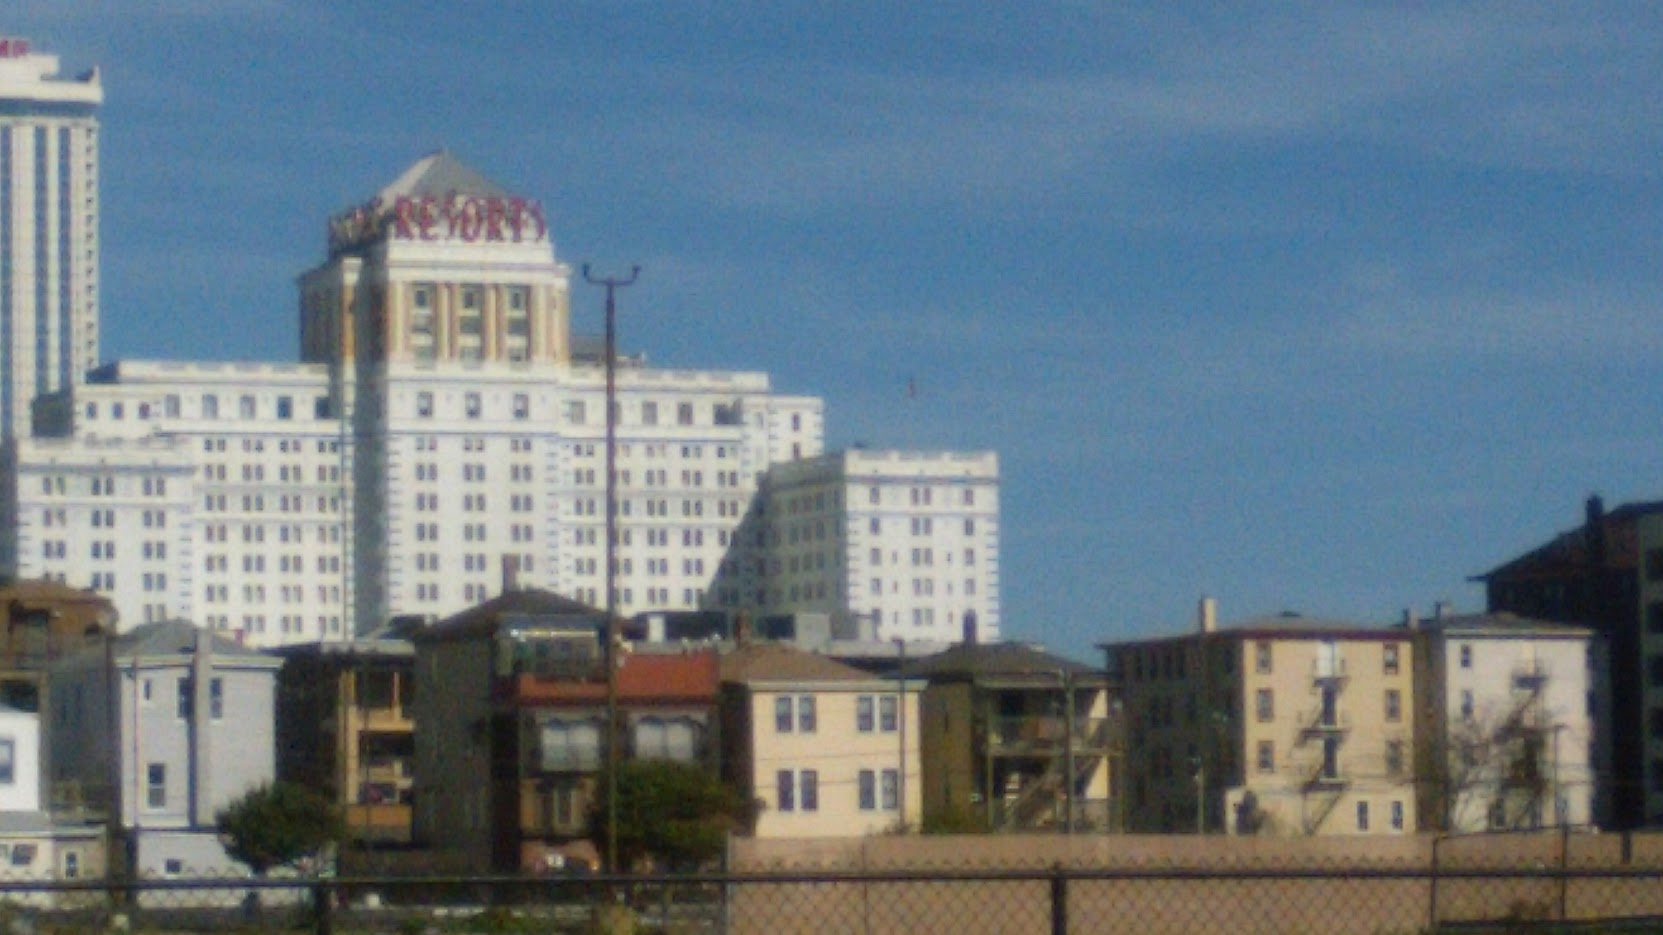 Resorts Casino Hotel, Atlantic City NJ